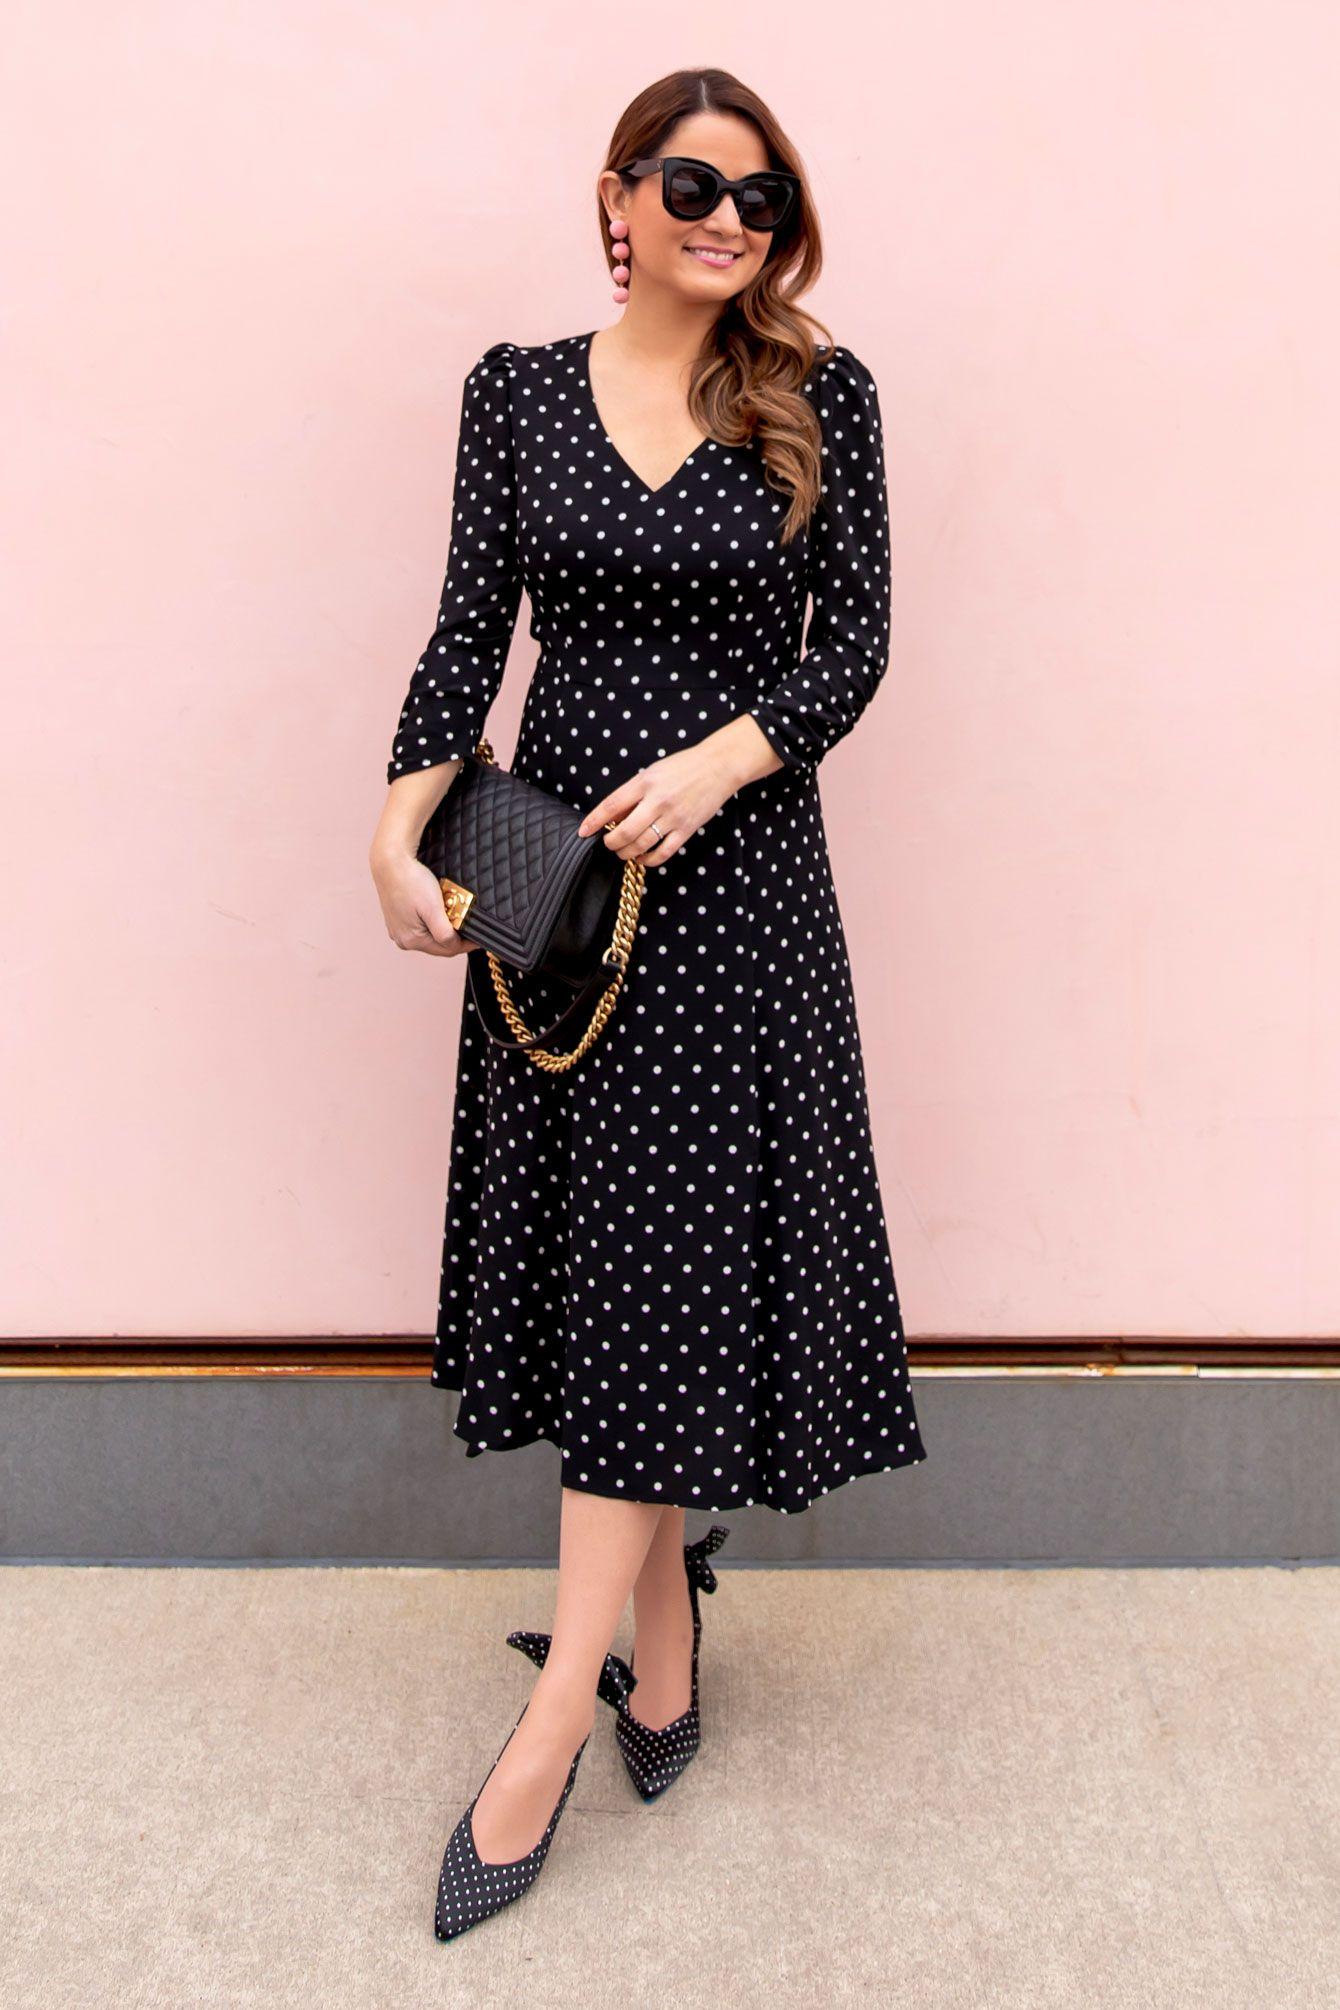 Styling A Long Sleeve Polka Dot Midi Dress Style Charade Dot Dress Outfit Midi Dress Outfit Polka Dress [ 2010 x 1340 Pixel ]